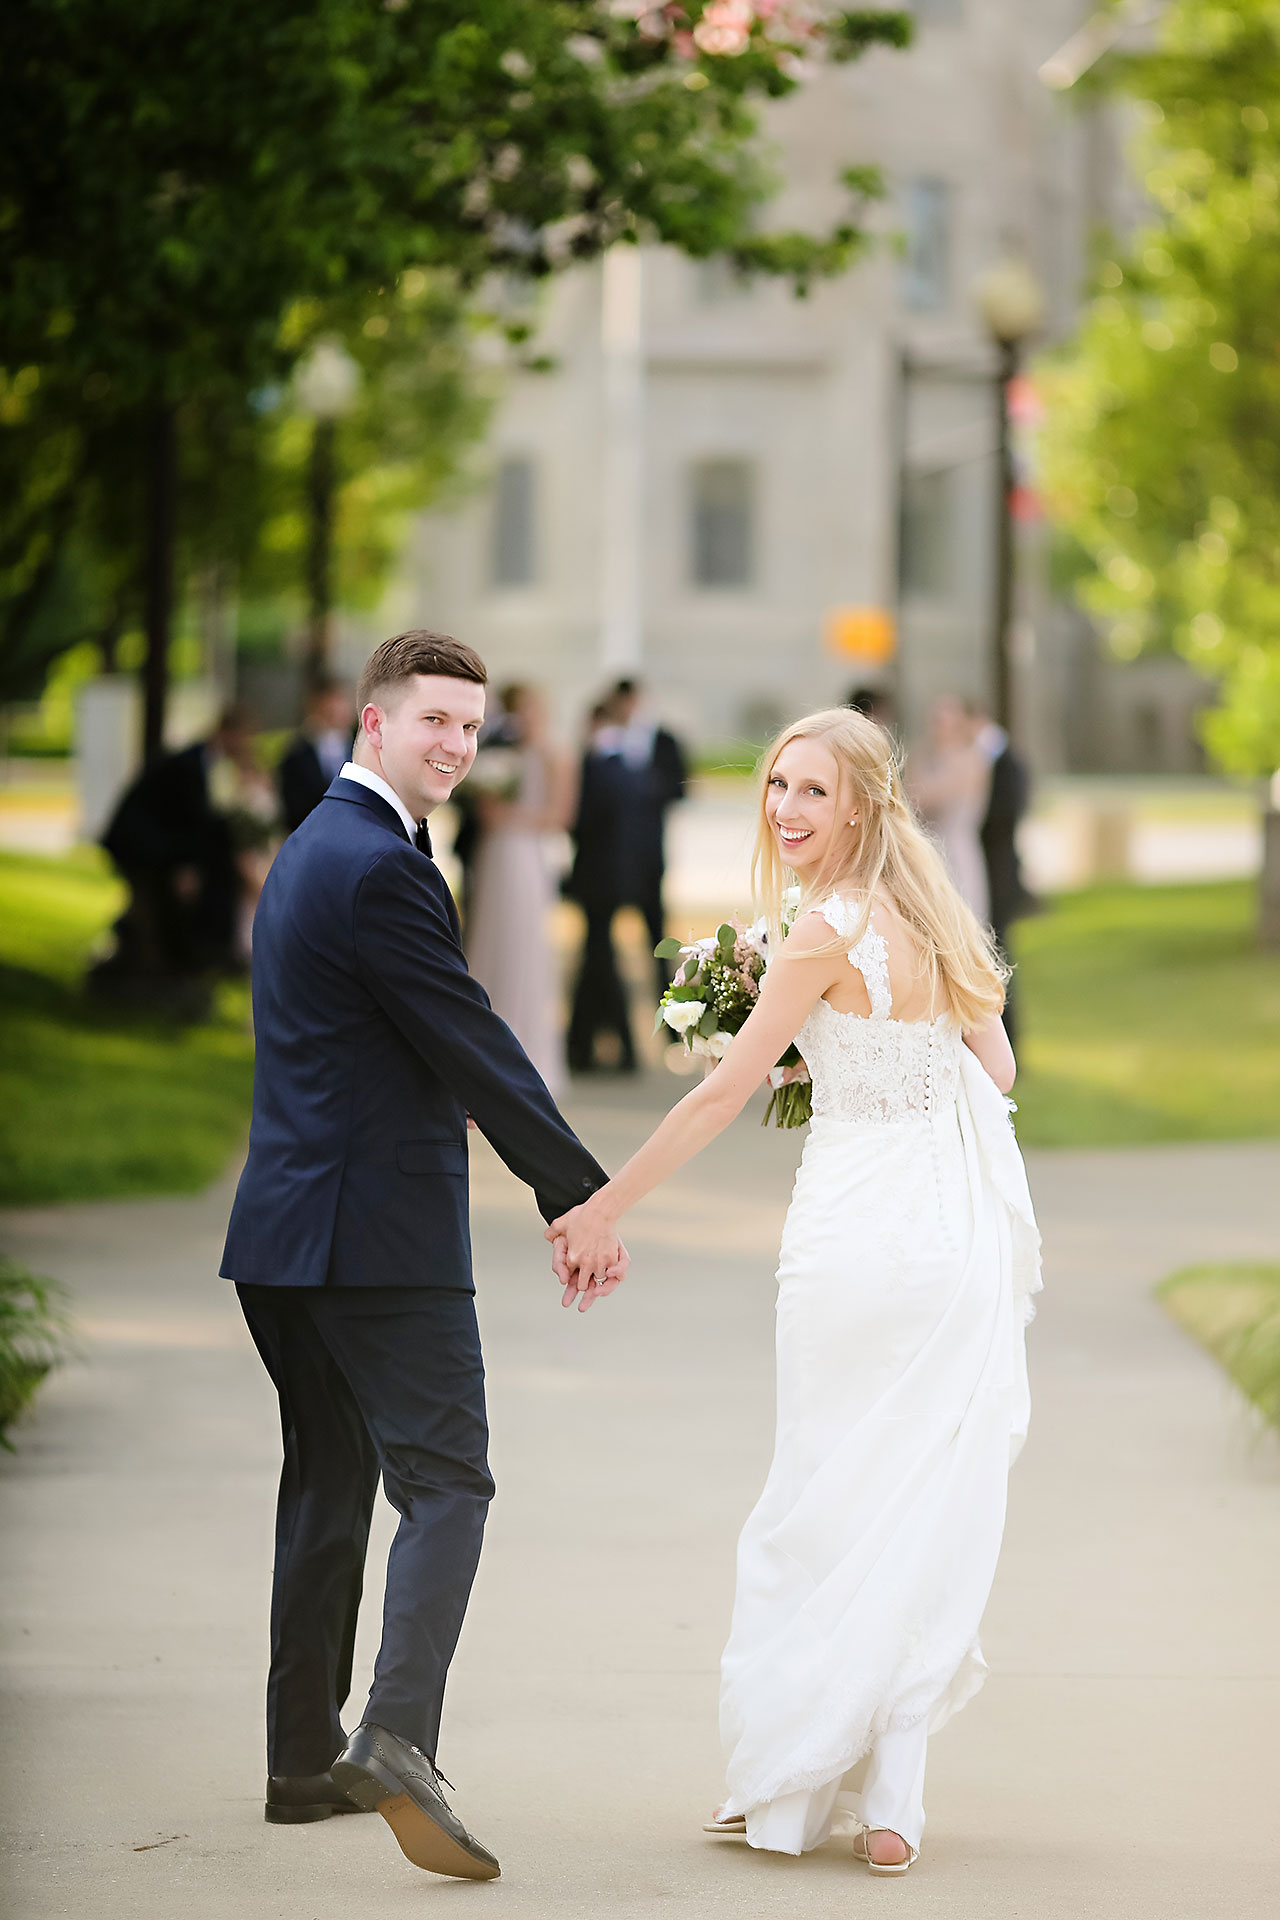 Molly Declan Scottish Rite Indianapolis Wedding 233